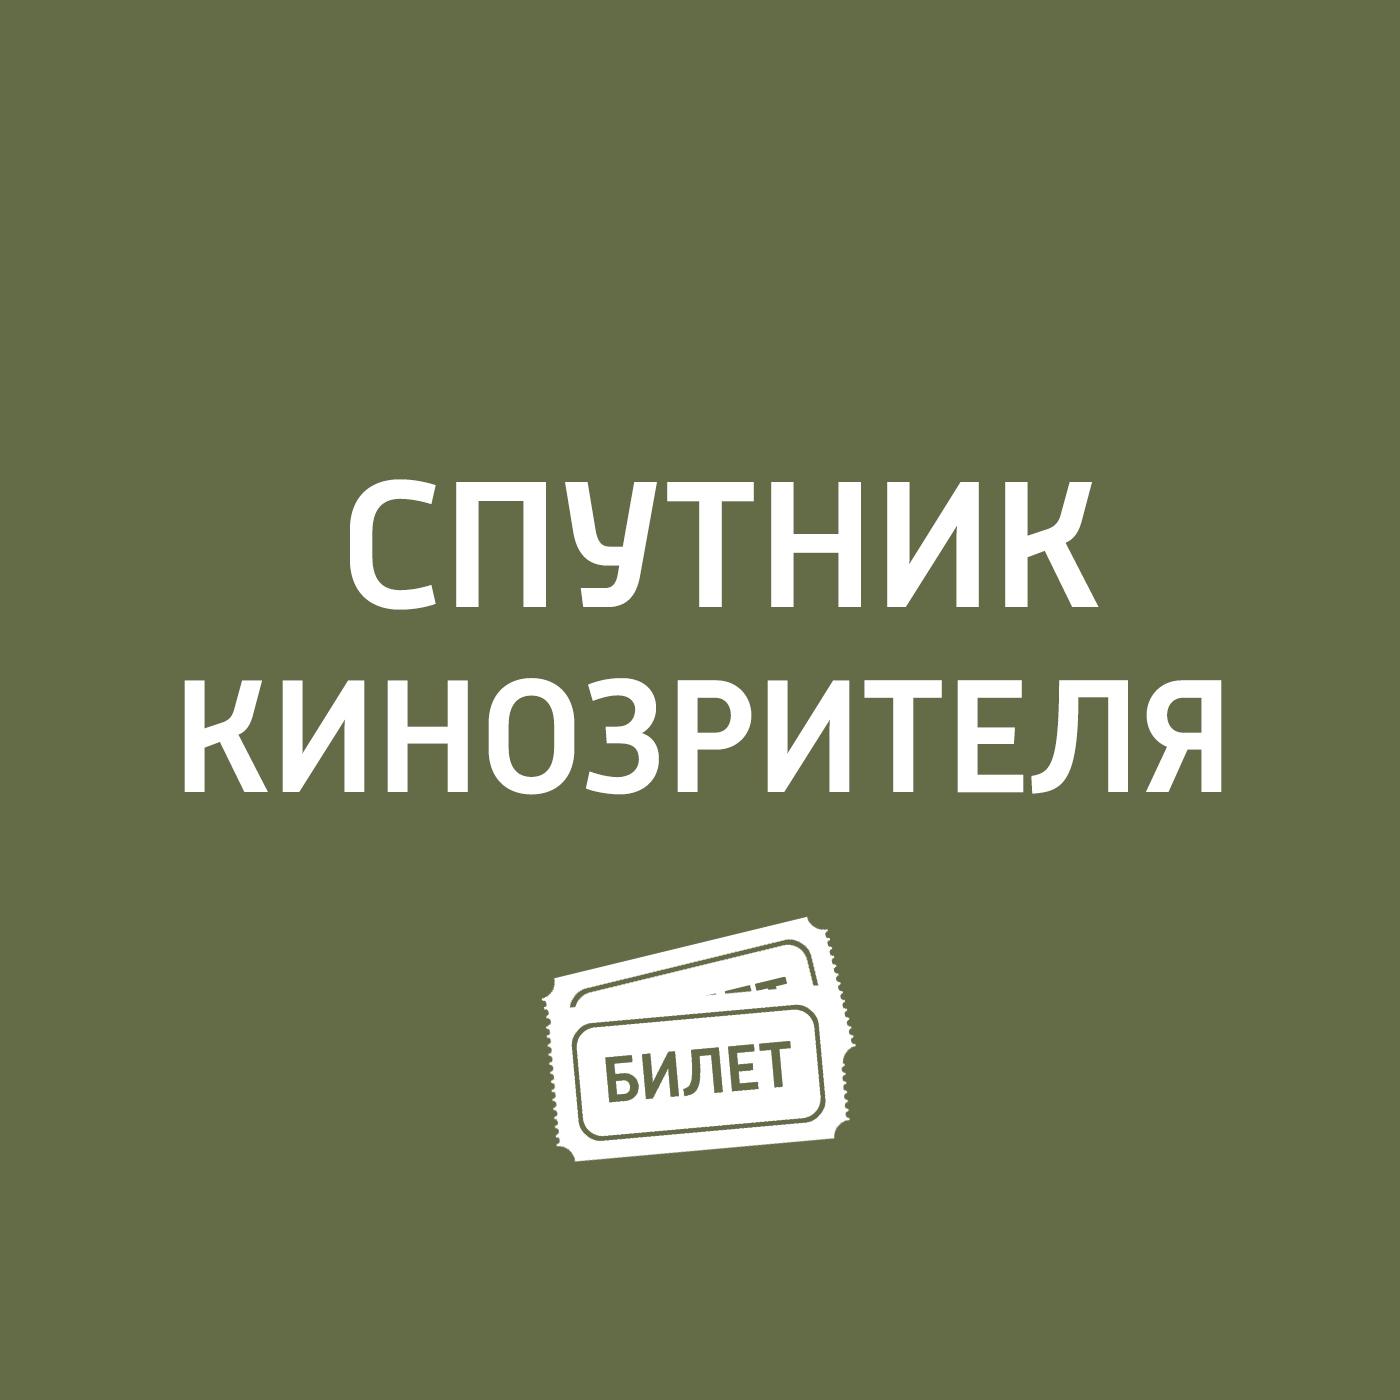 Антон Долин Орда антон долин форс мажор мстители 2 эра альтрона